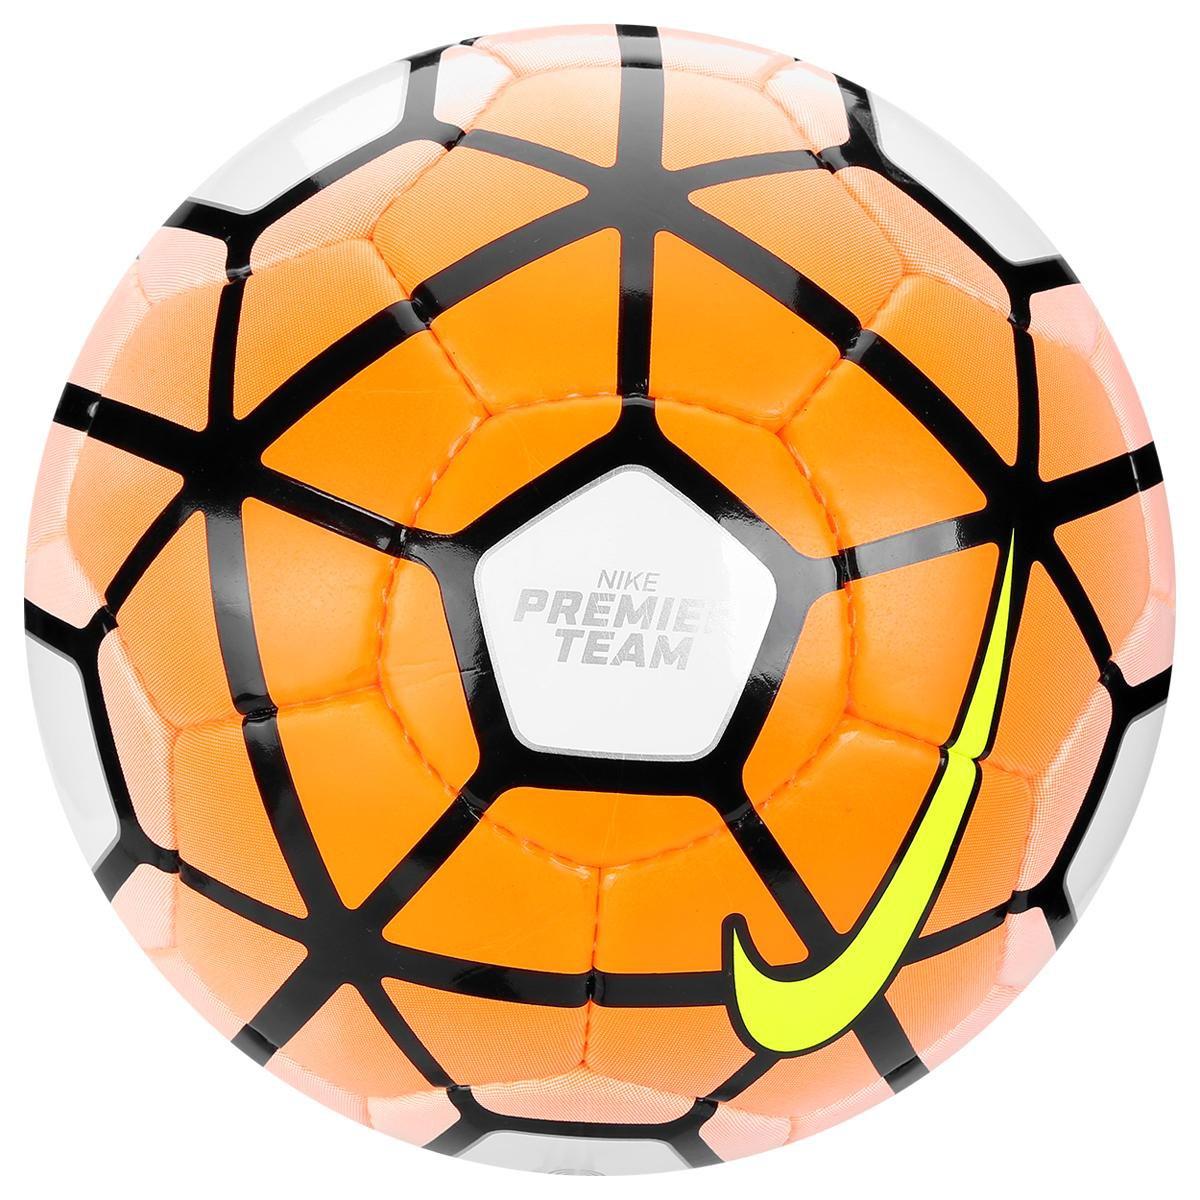 Bola Futebol Nike Premier Team Fifa Campo - Compre Agora  347e90adcc8c6